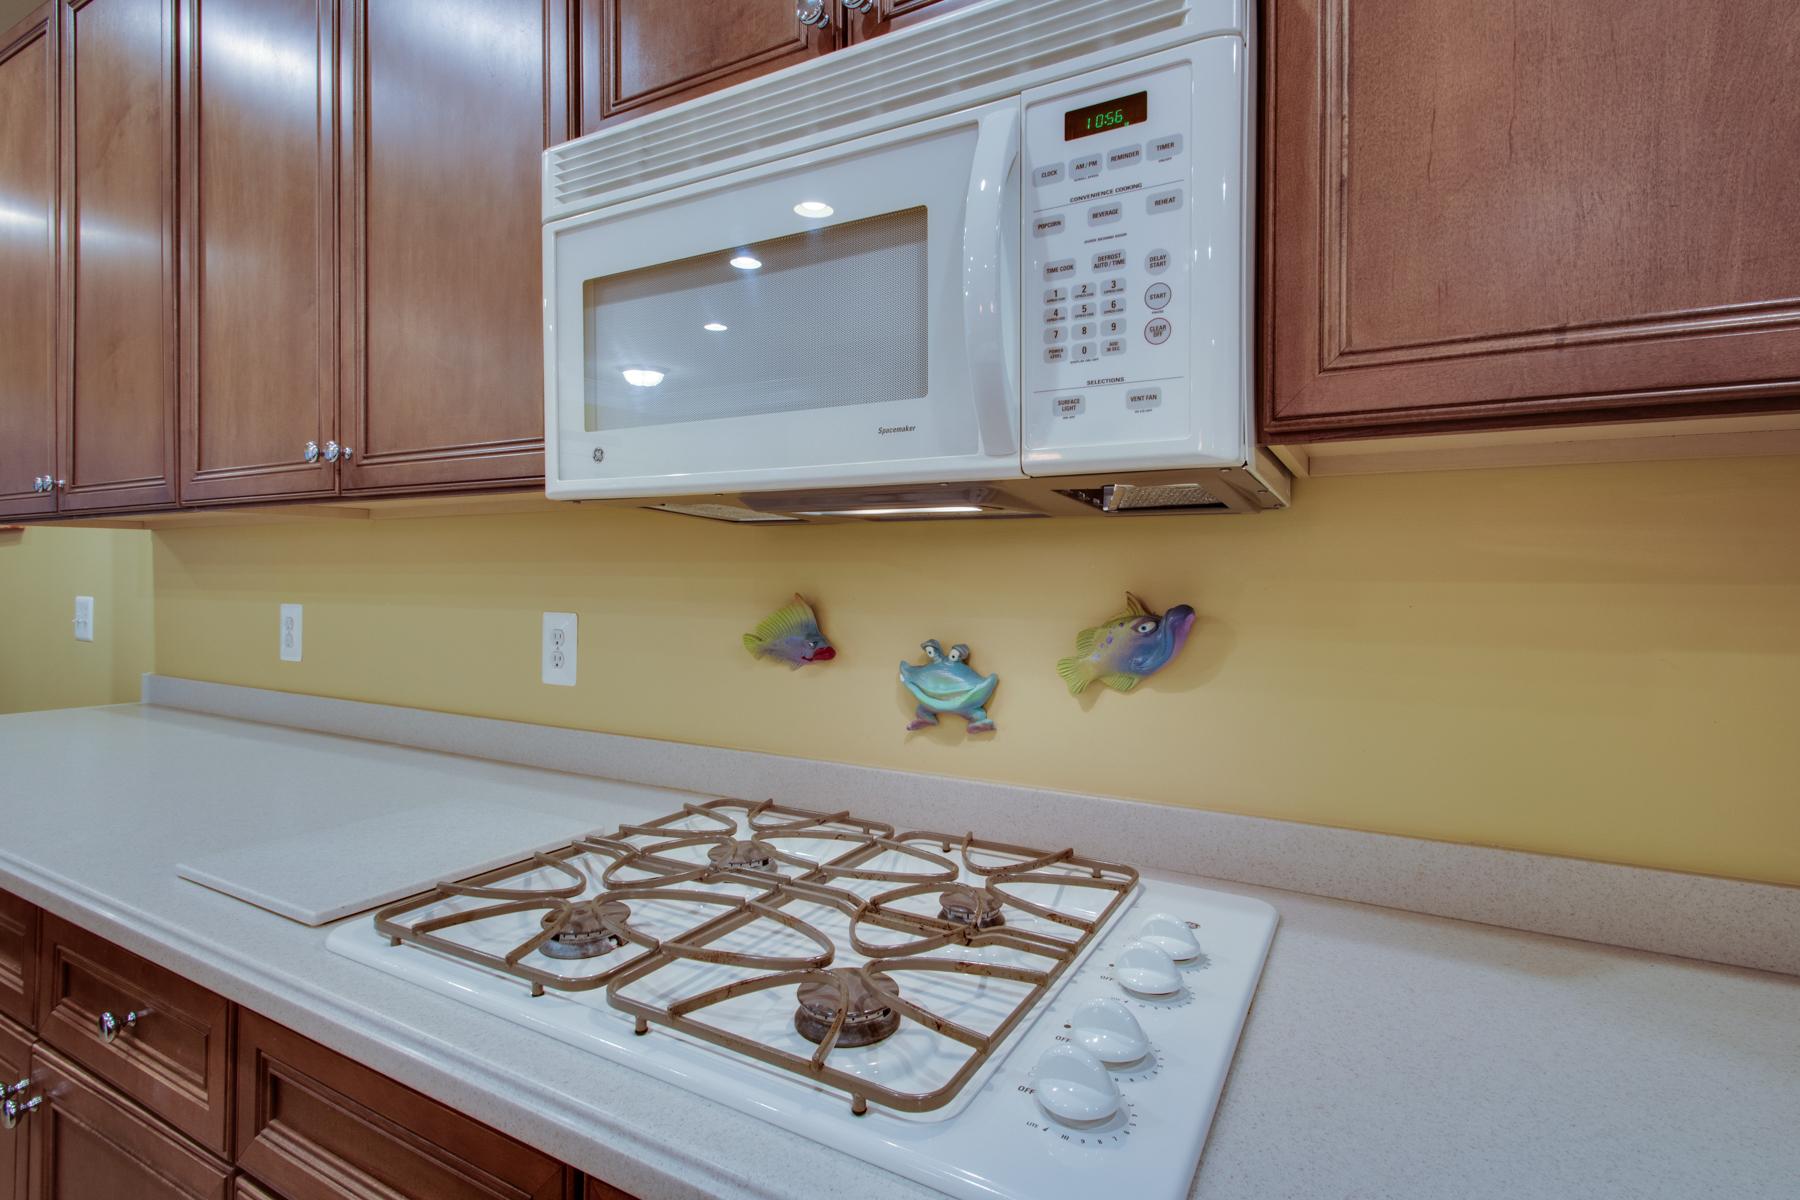 Additional photo for property listing at Veranda 33139 Serenity Circle , 84, Millsboro, Delaware 19966 Hoa Kỳ